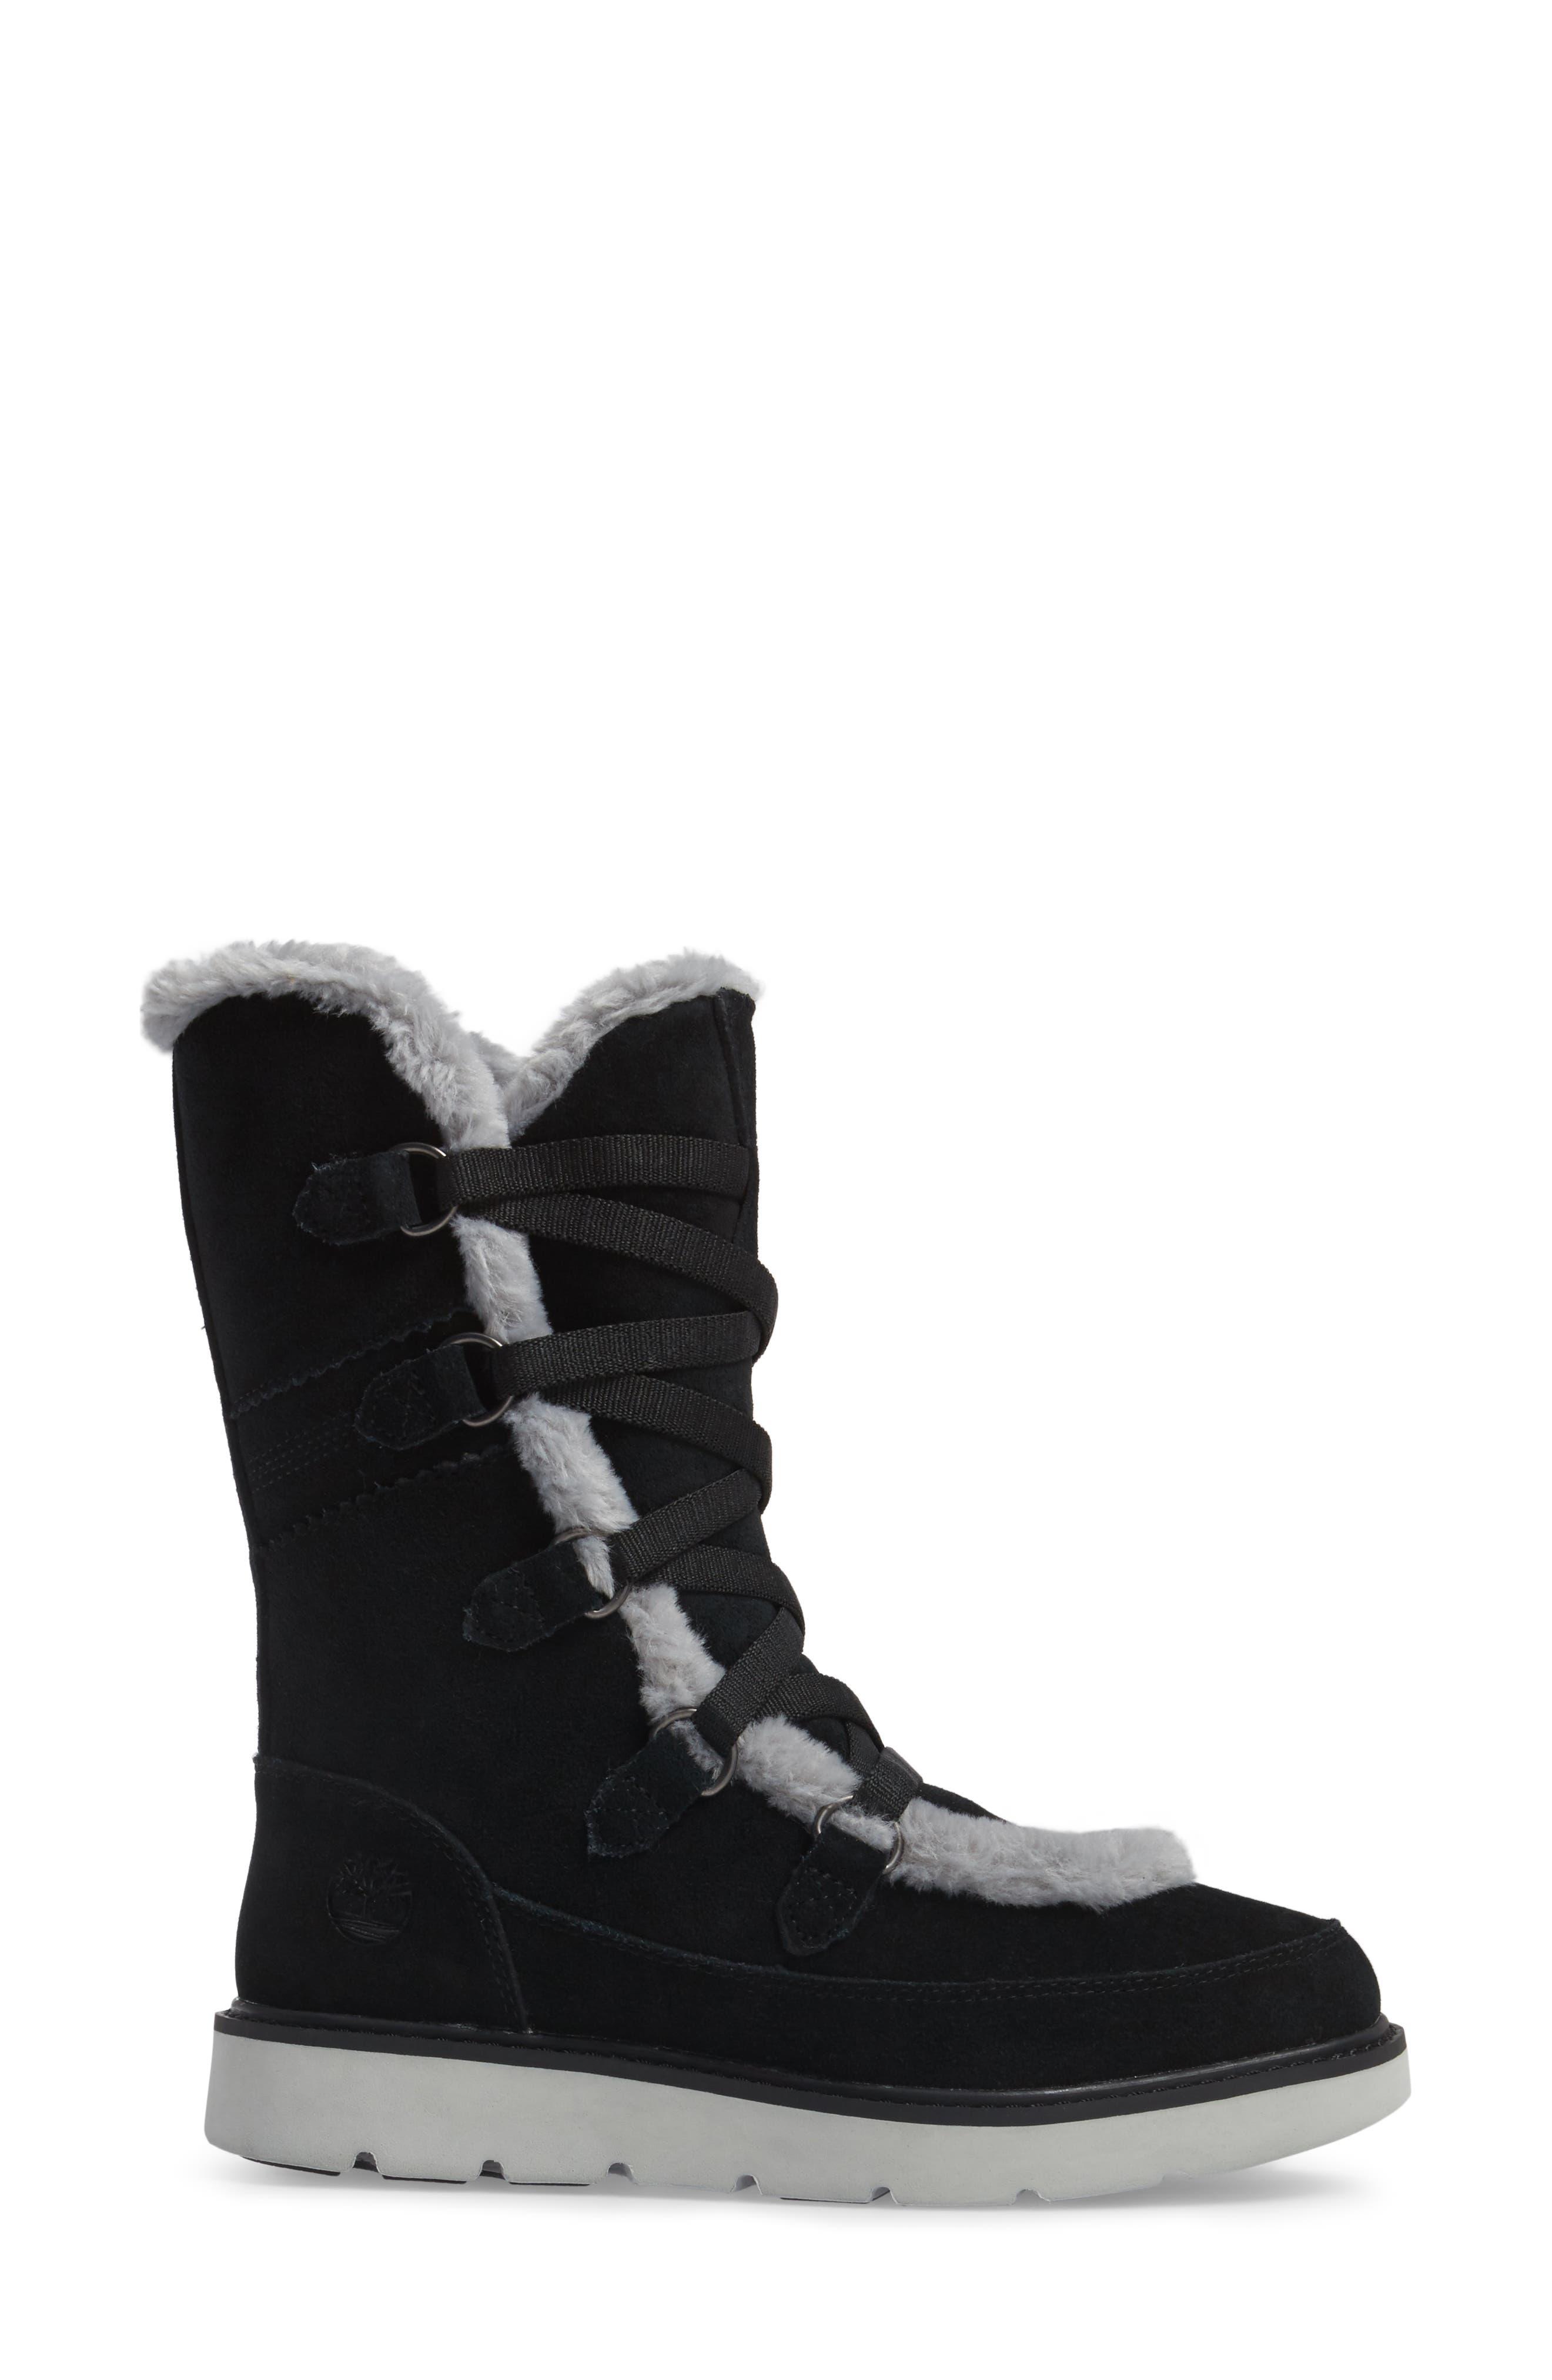 Kenniston Faux Fur Water Resistant Mukluk Boot,                             Alternate thumbnail 3, color,                             001